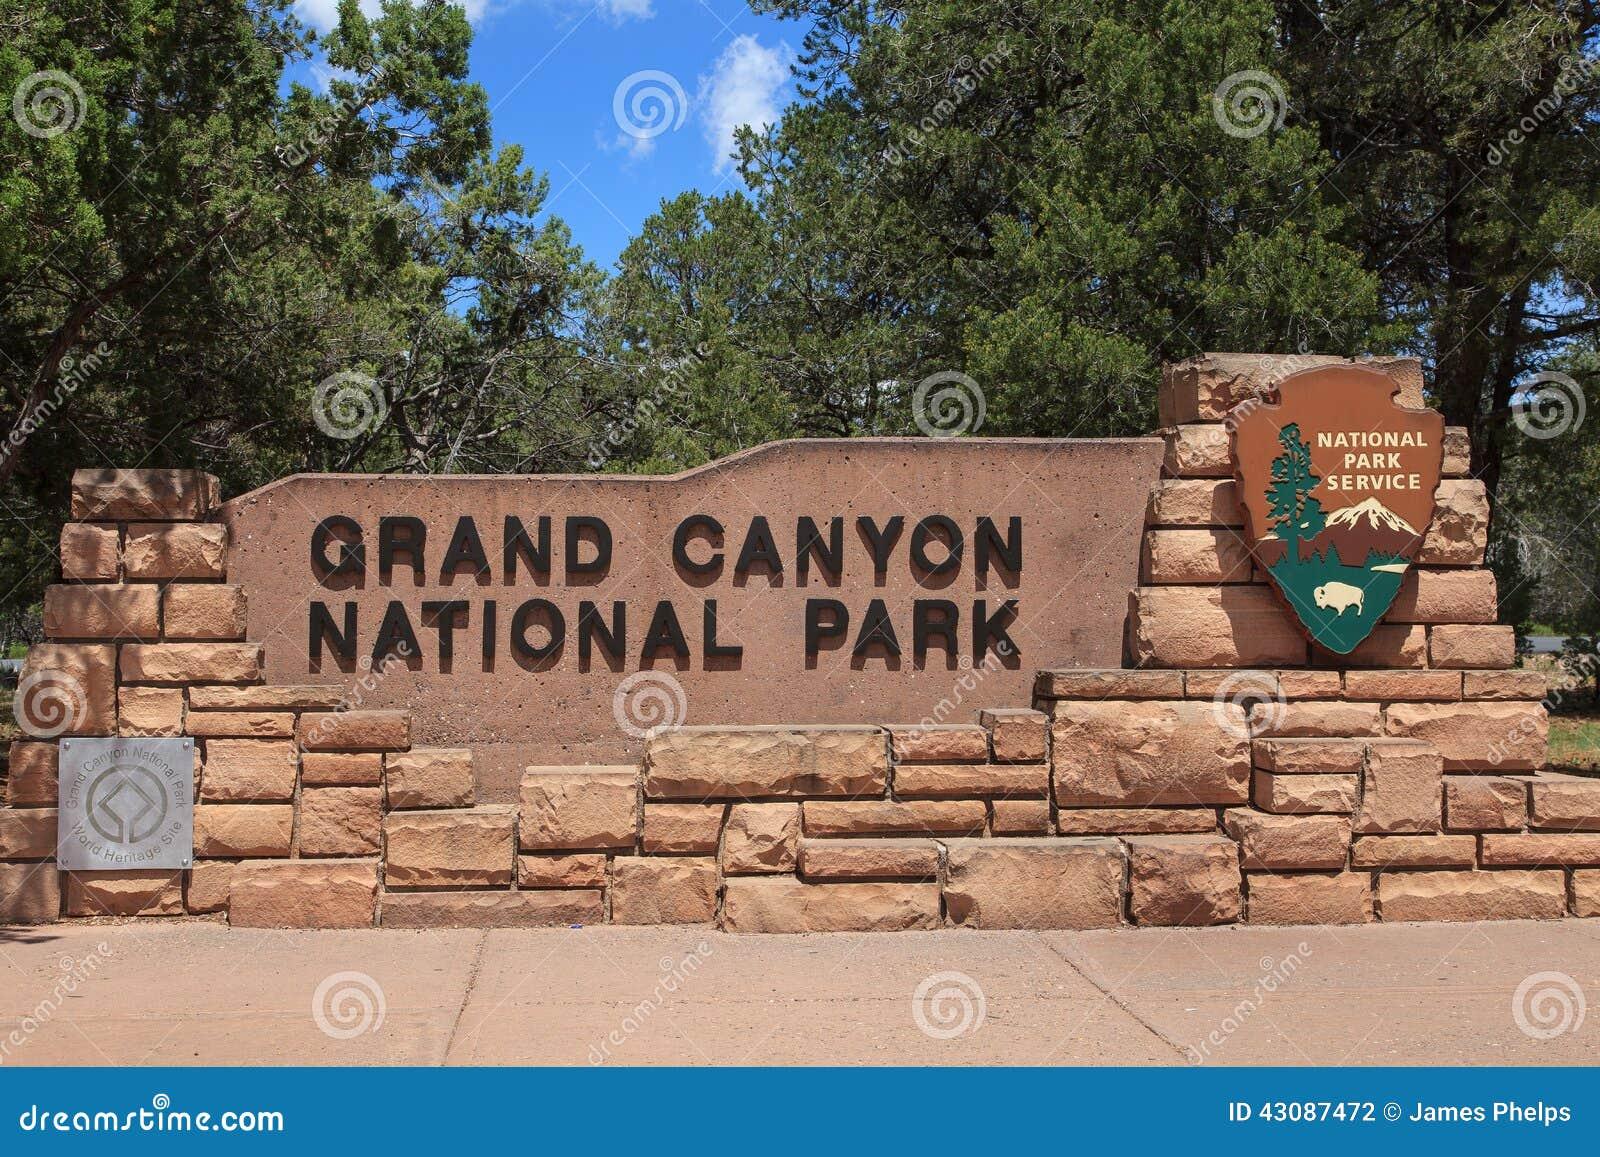 Grand Canyon National Park Entrance Signarizona Stock